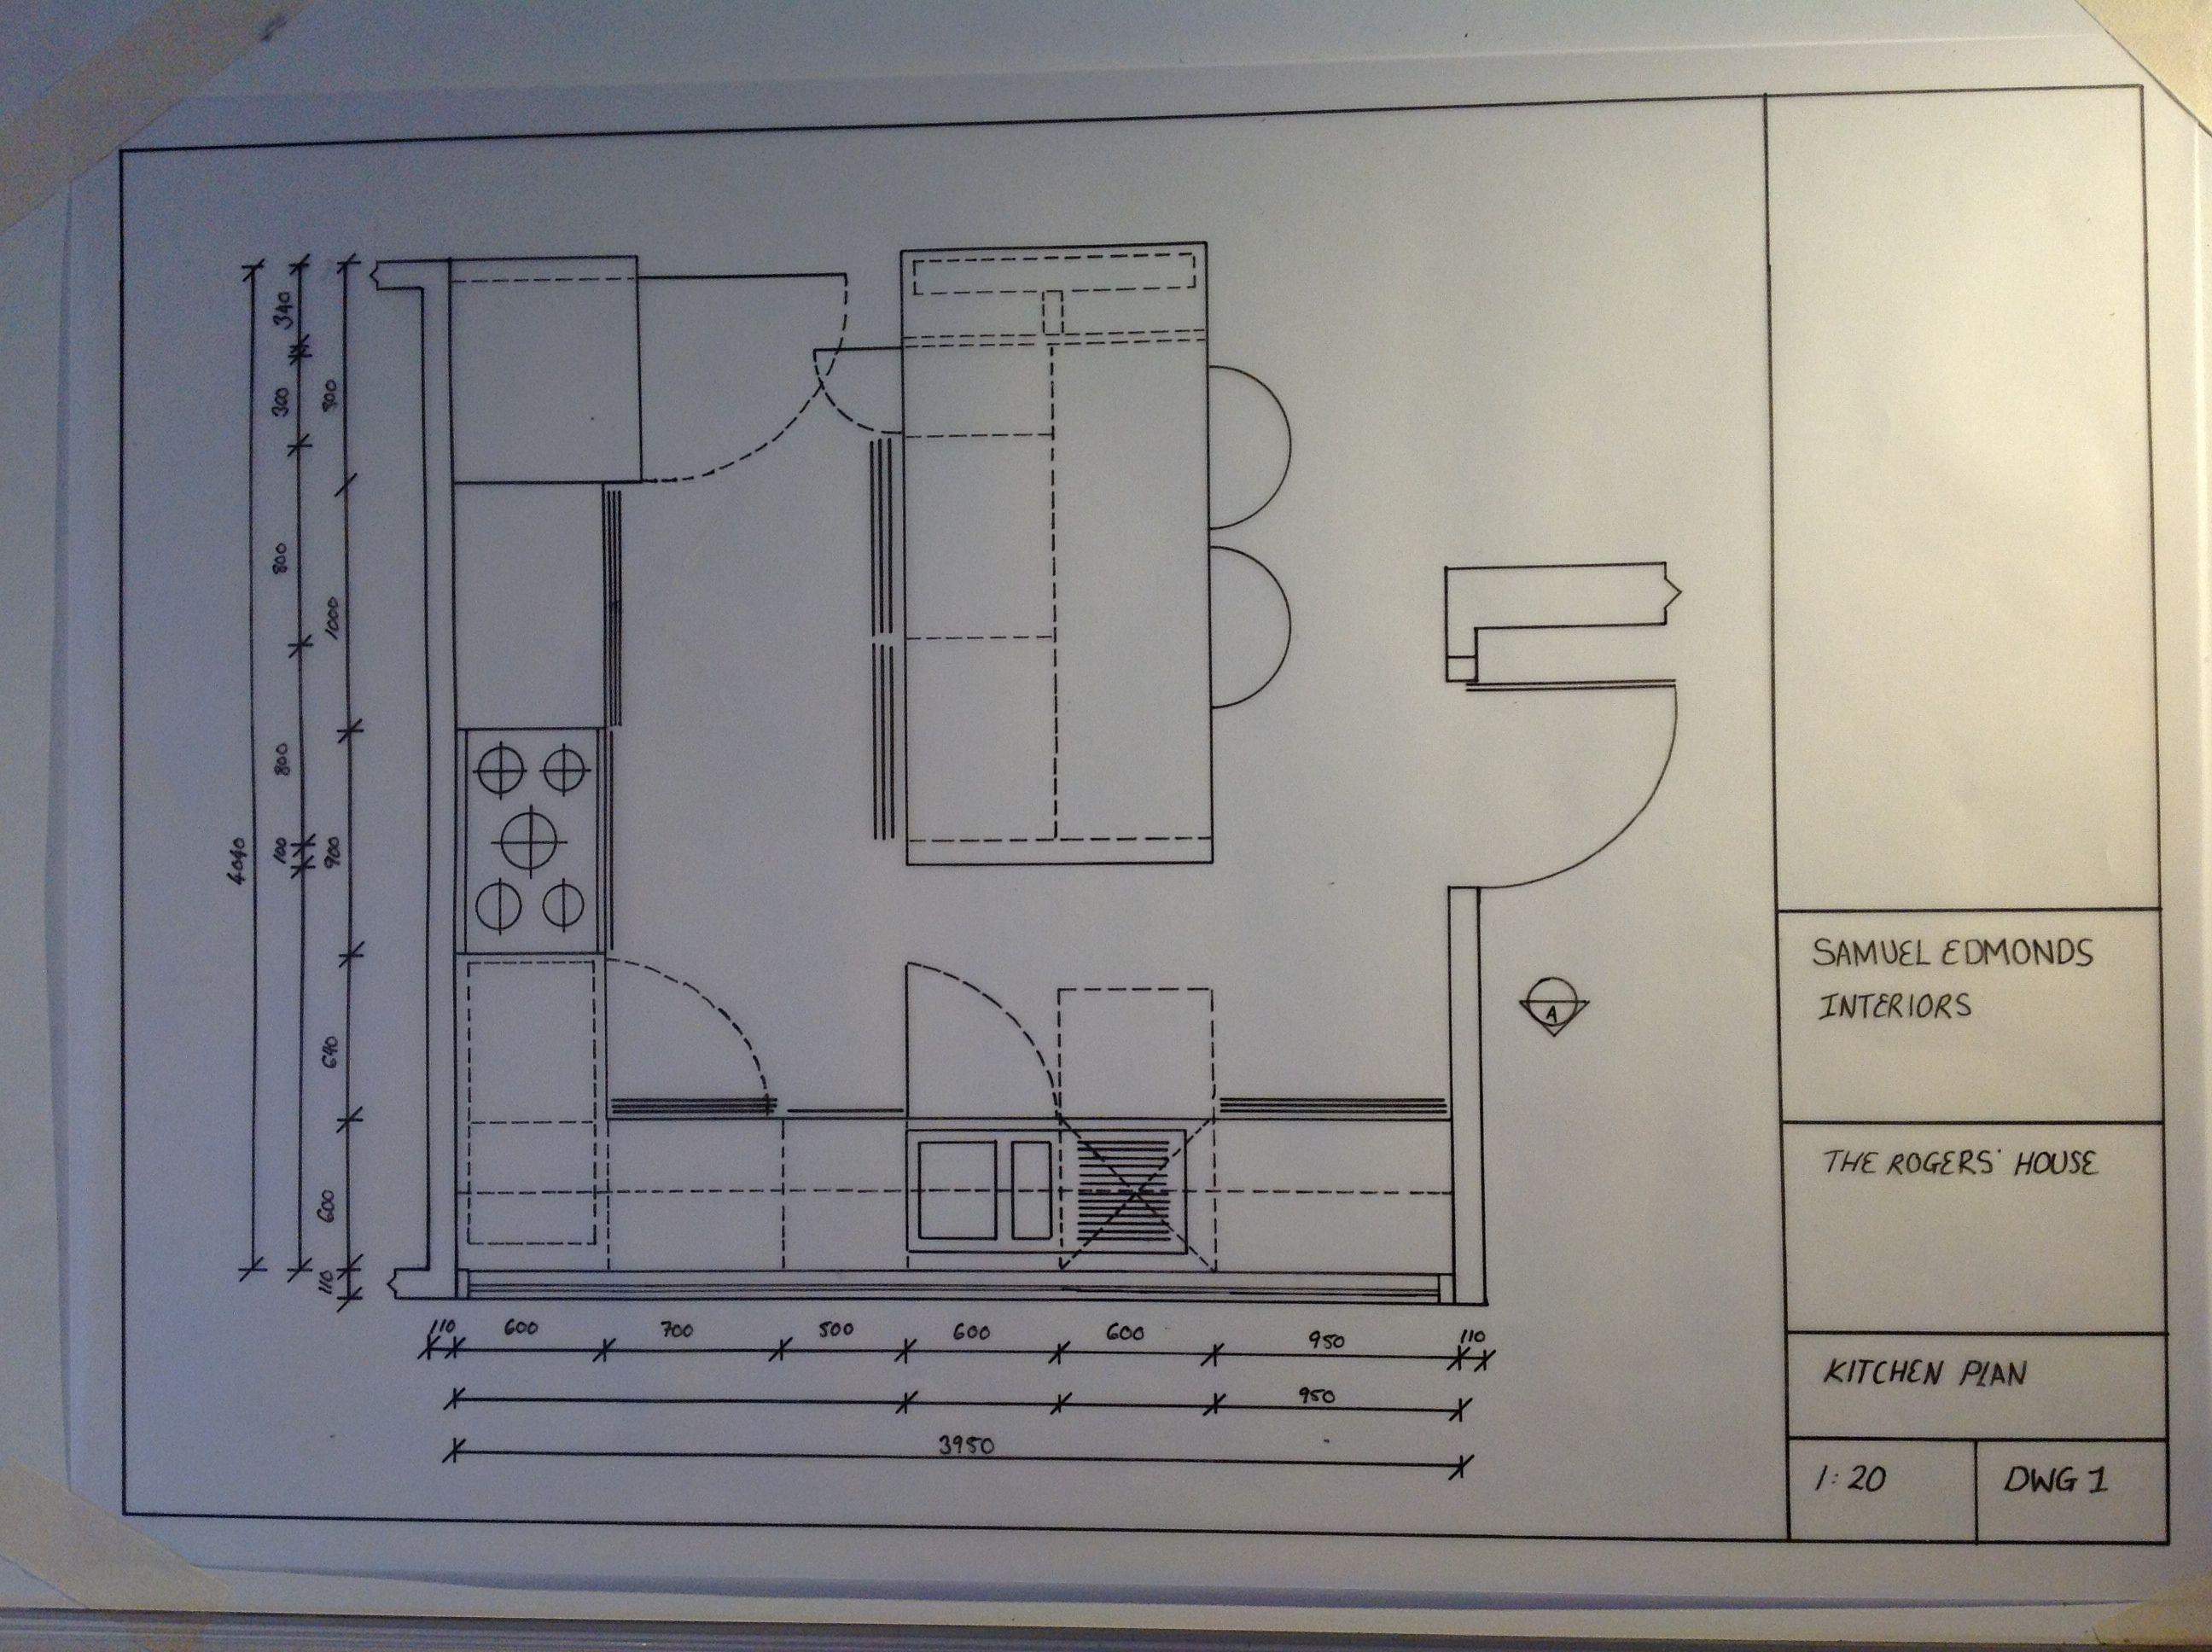 2592x1936 Kitchen Plan